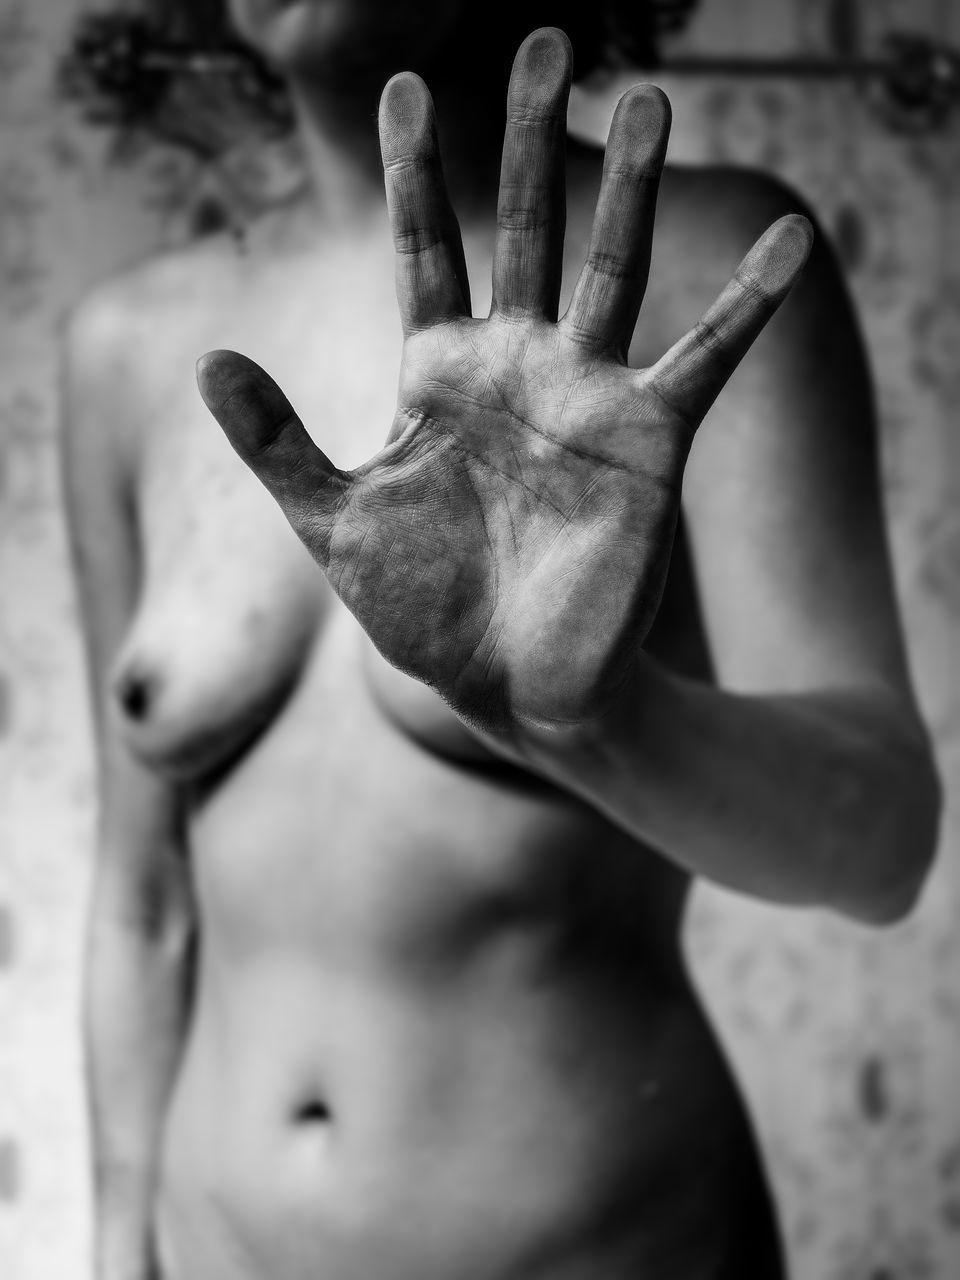 CLOSE-UP OF SHIRTLESS BABY HAND